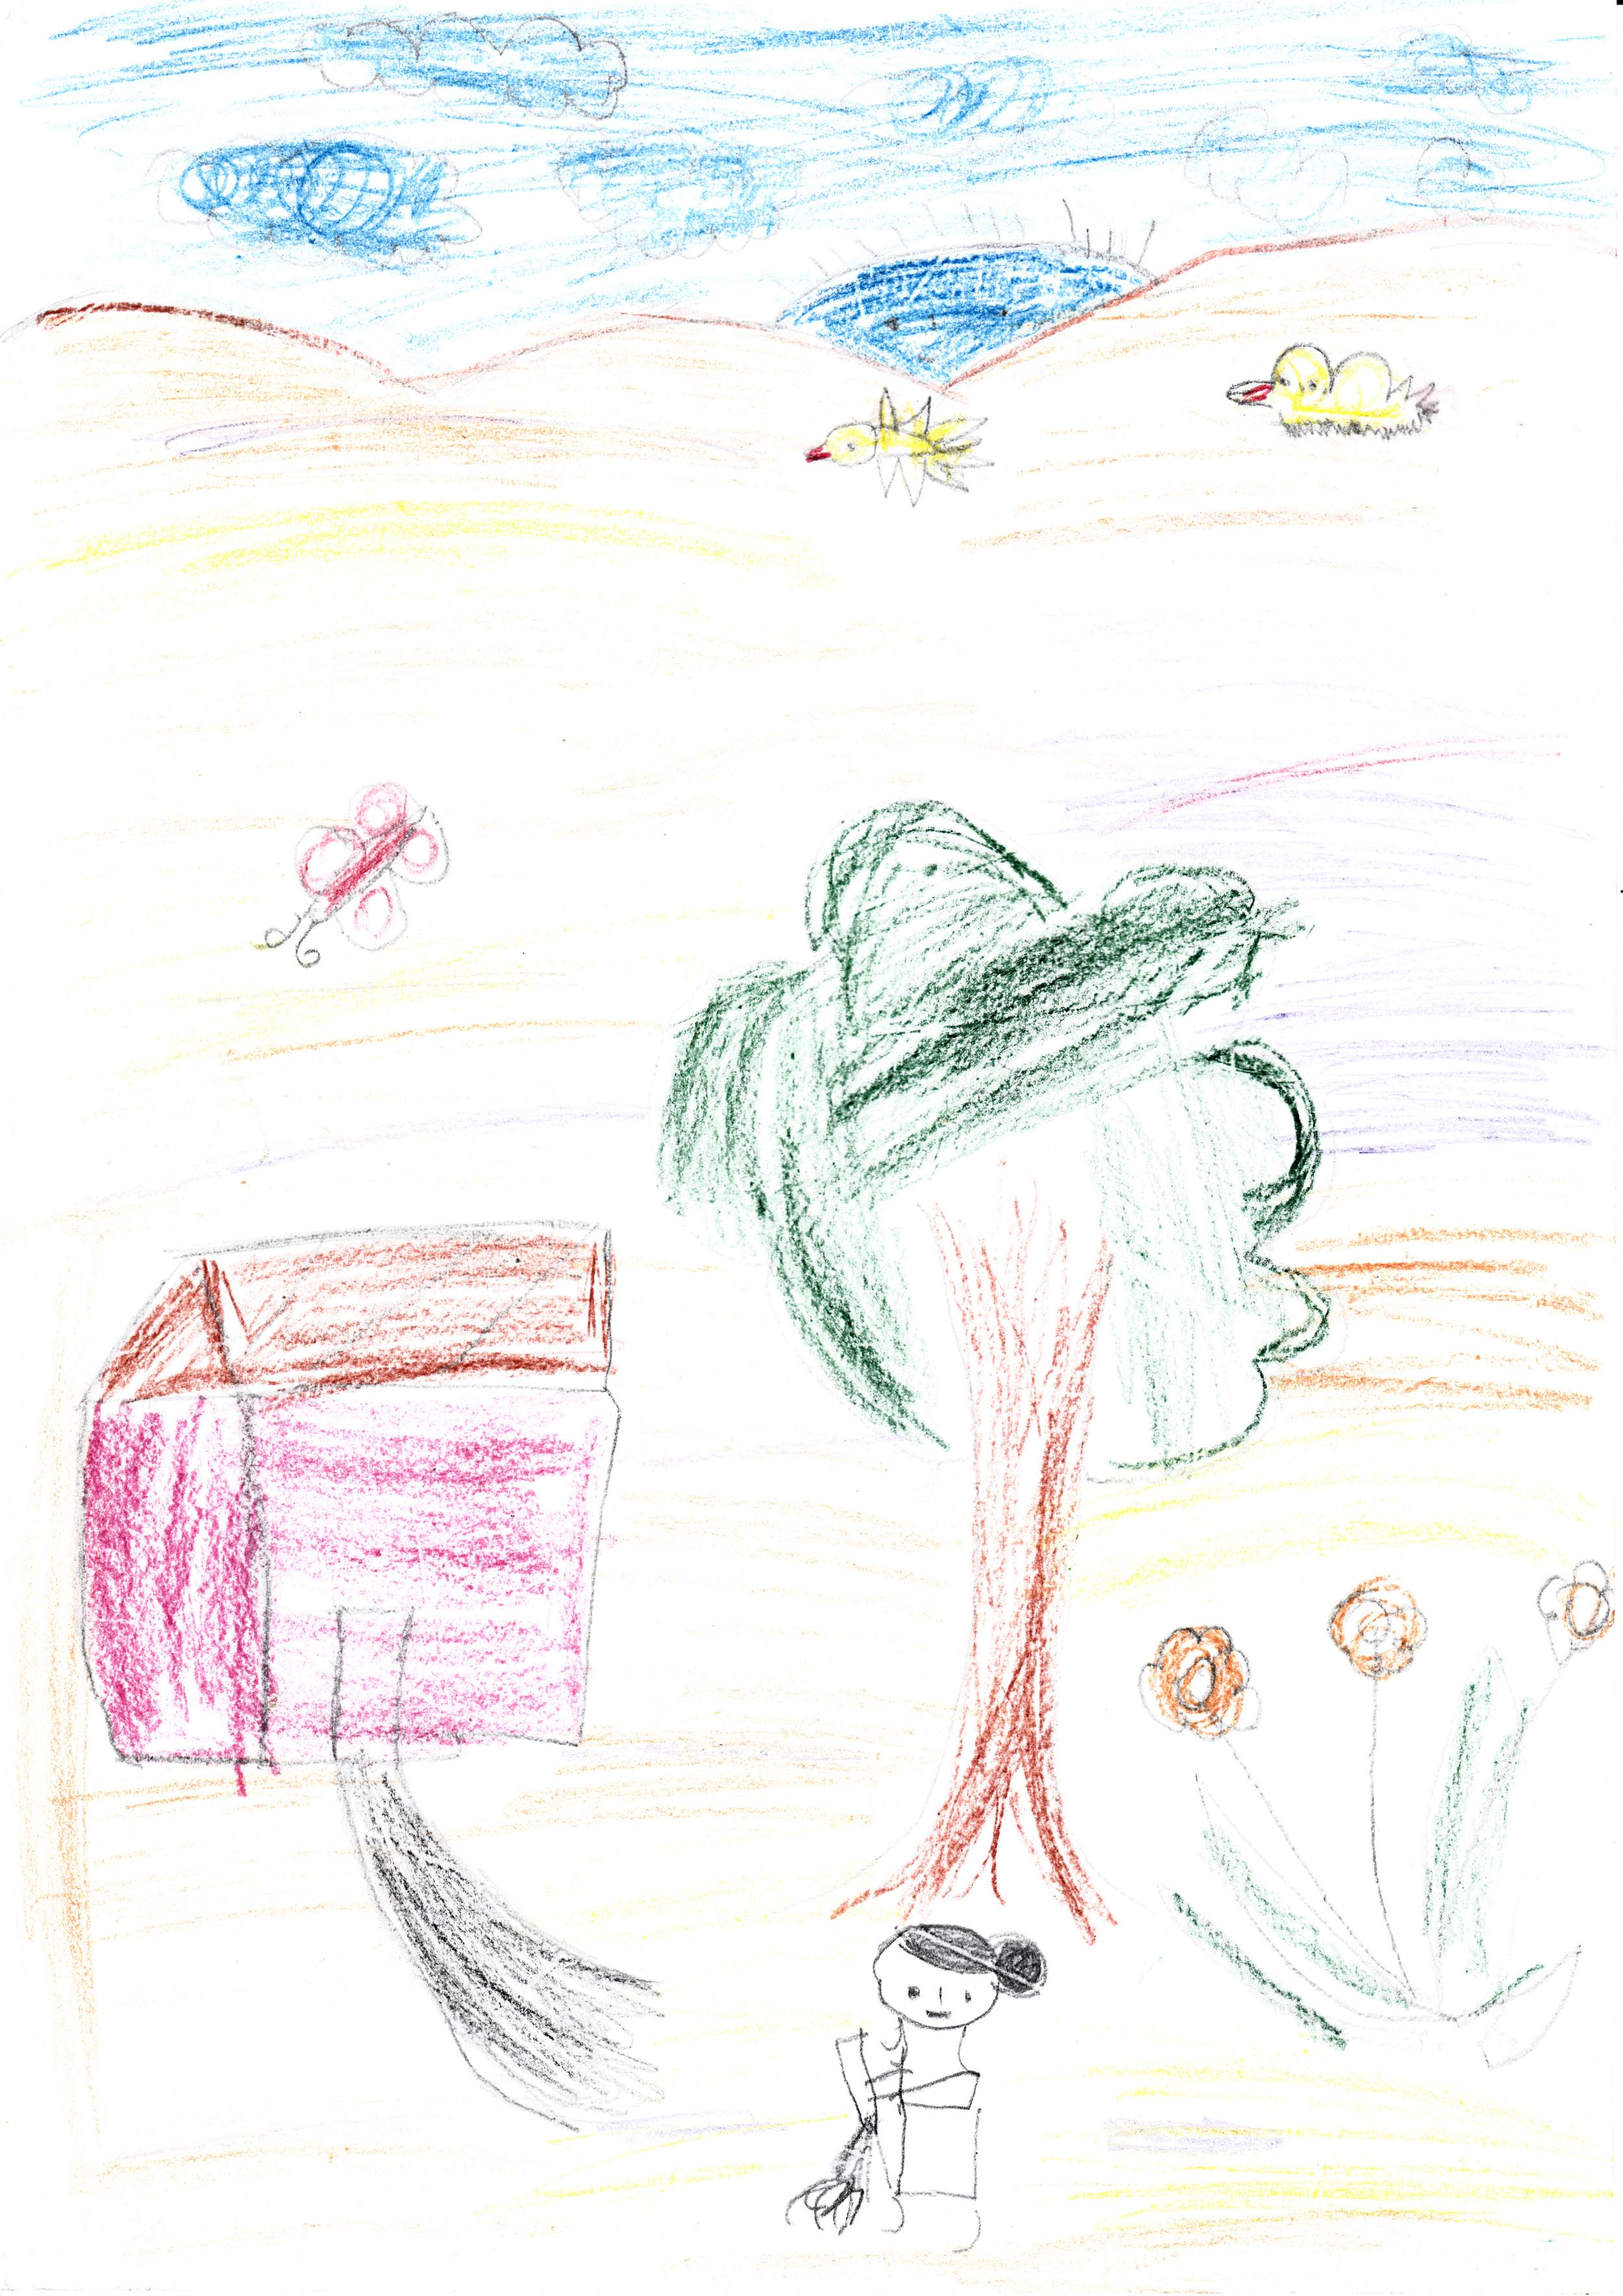 Students art work from Bolawalana Orphanage 3_0040.jpg